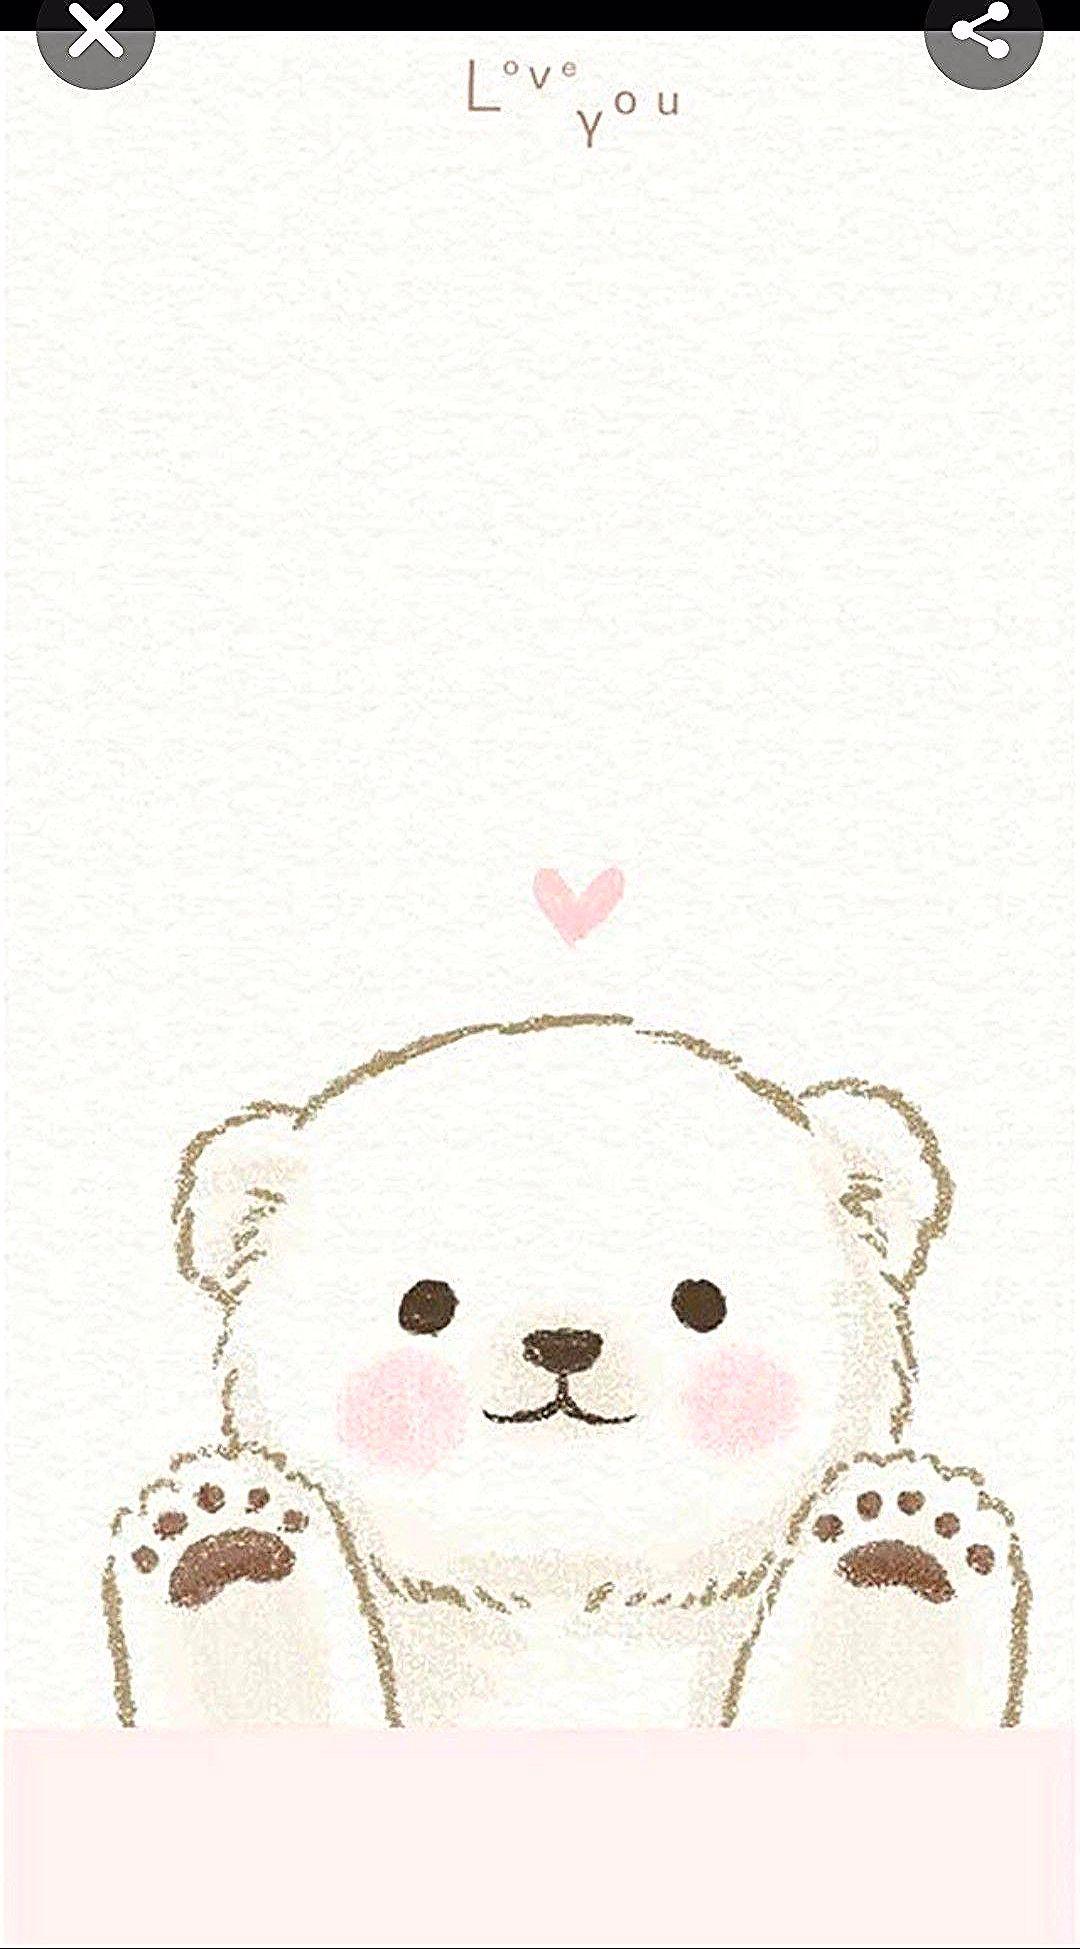 Pin By Tsolkoda Joanna On Sfondi Per Bambini Cute Cartoon Wallpapers Cute Wallpapers Cubs Wallpaper